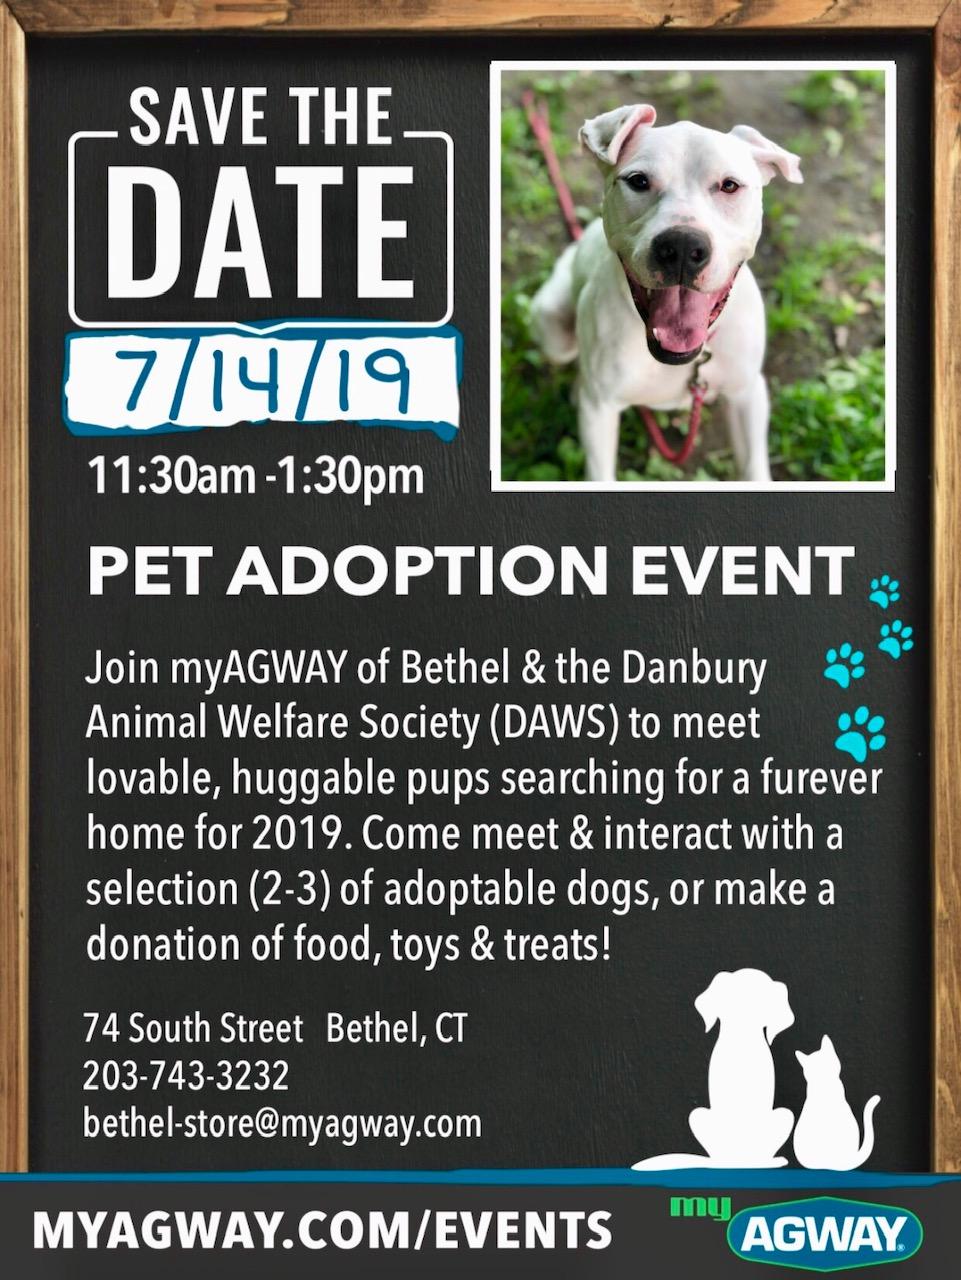 Daws Agway Adoption Event July 14 2019 Danbury Animal Welfare Society